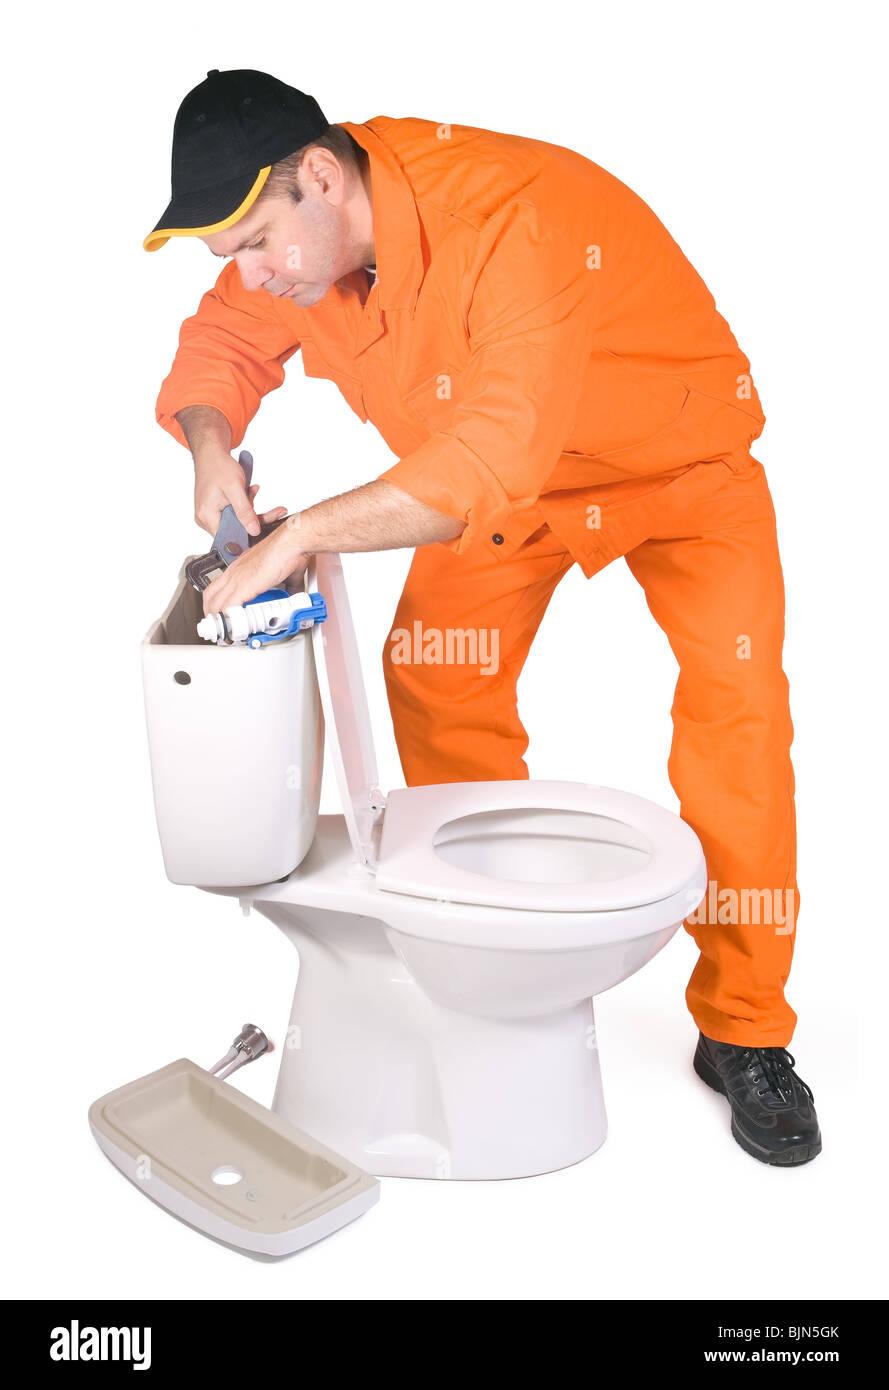 plumber mounted toilet bowl Stock Photo: 28739555 - Alamy